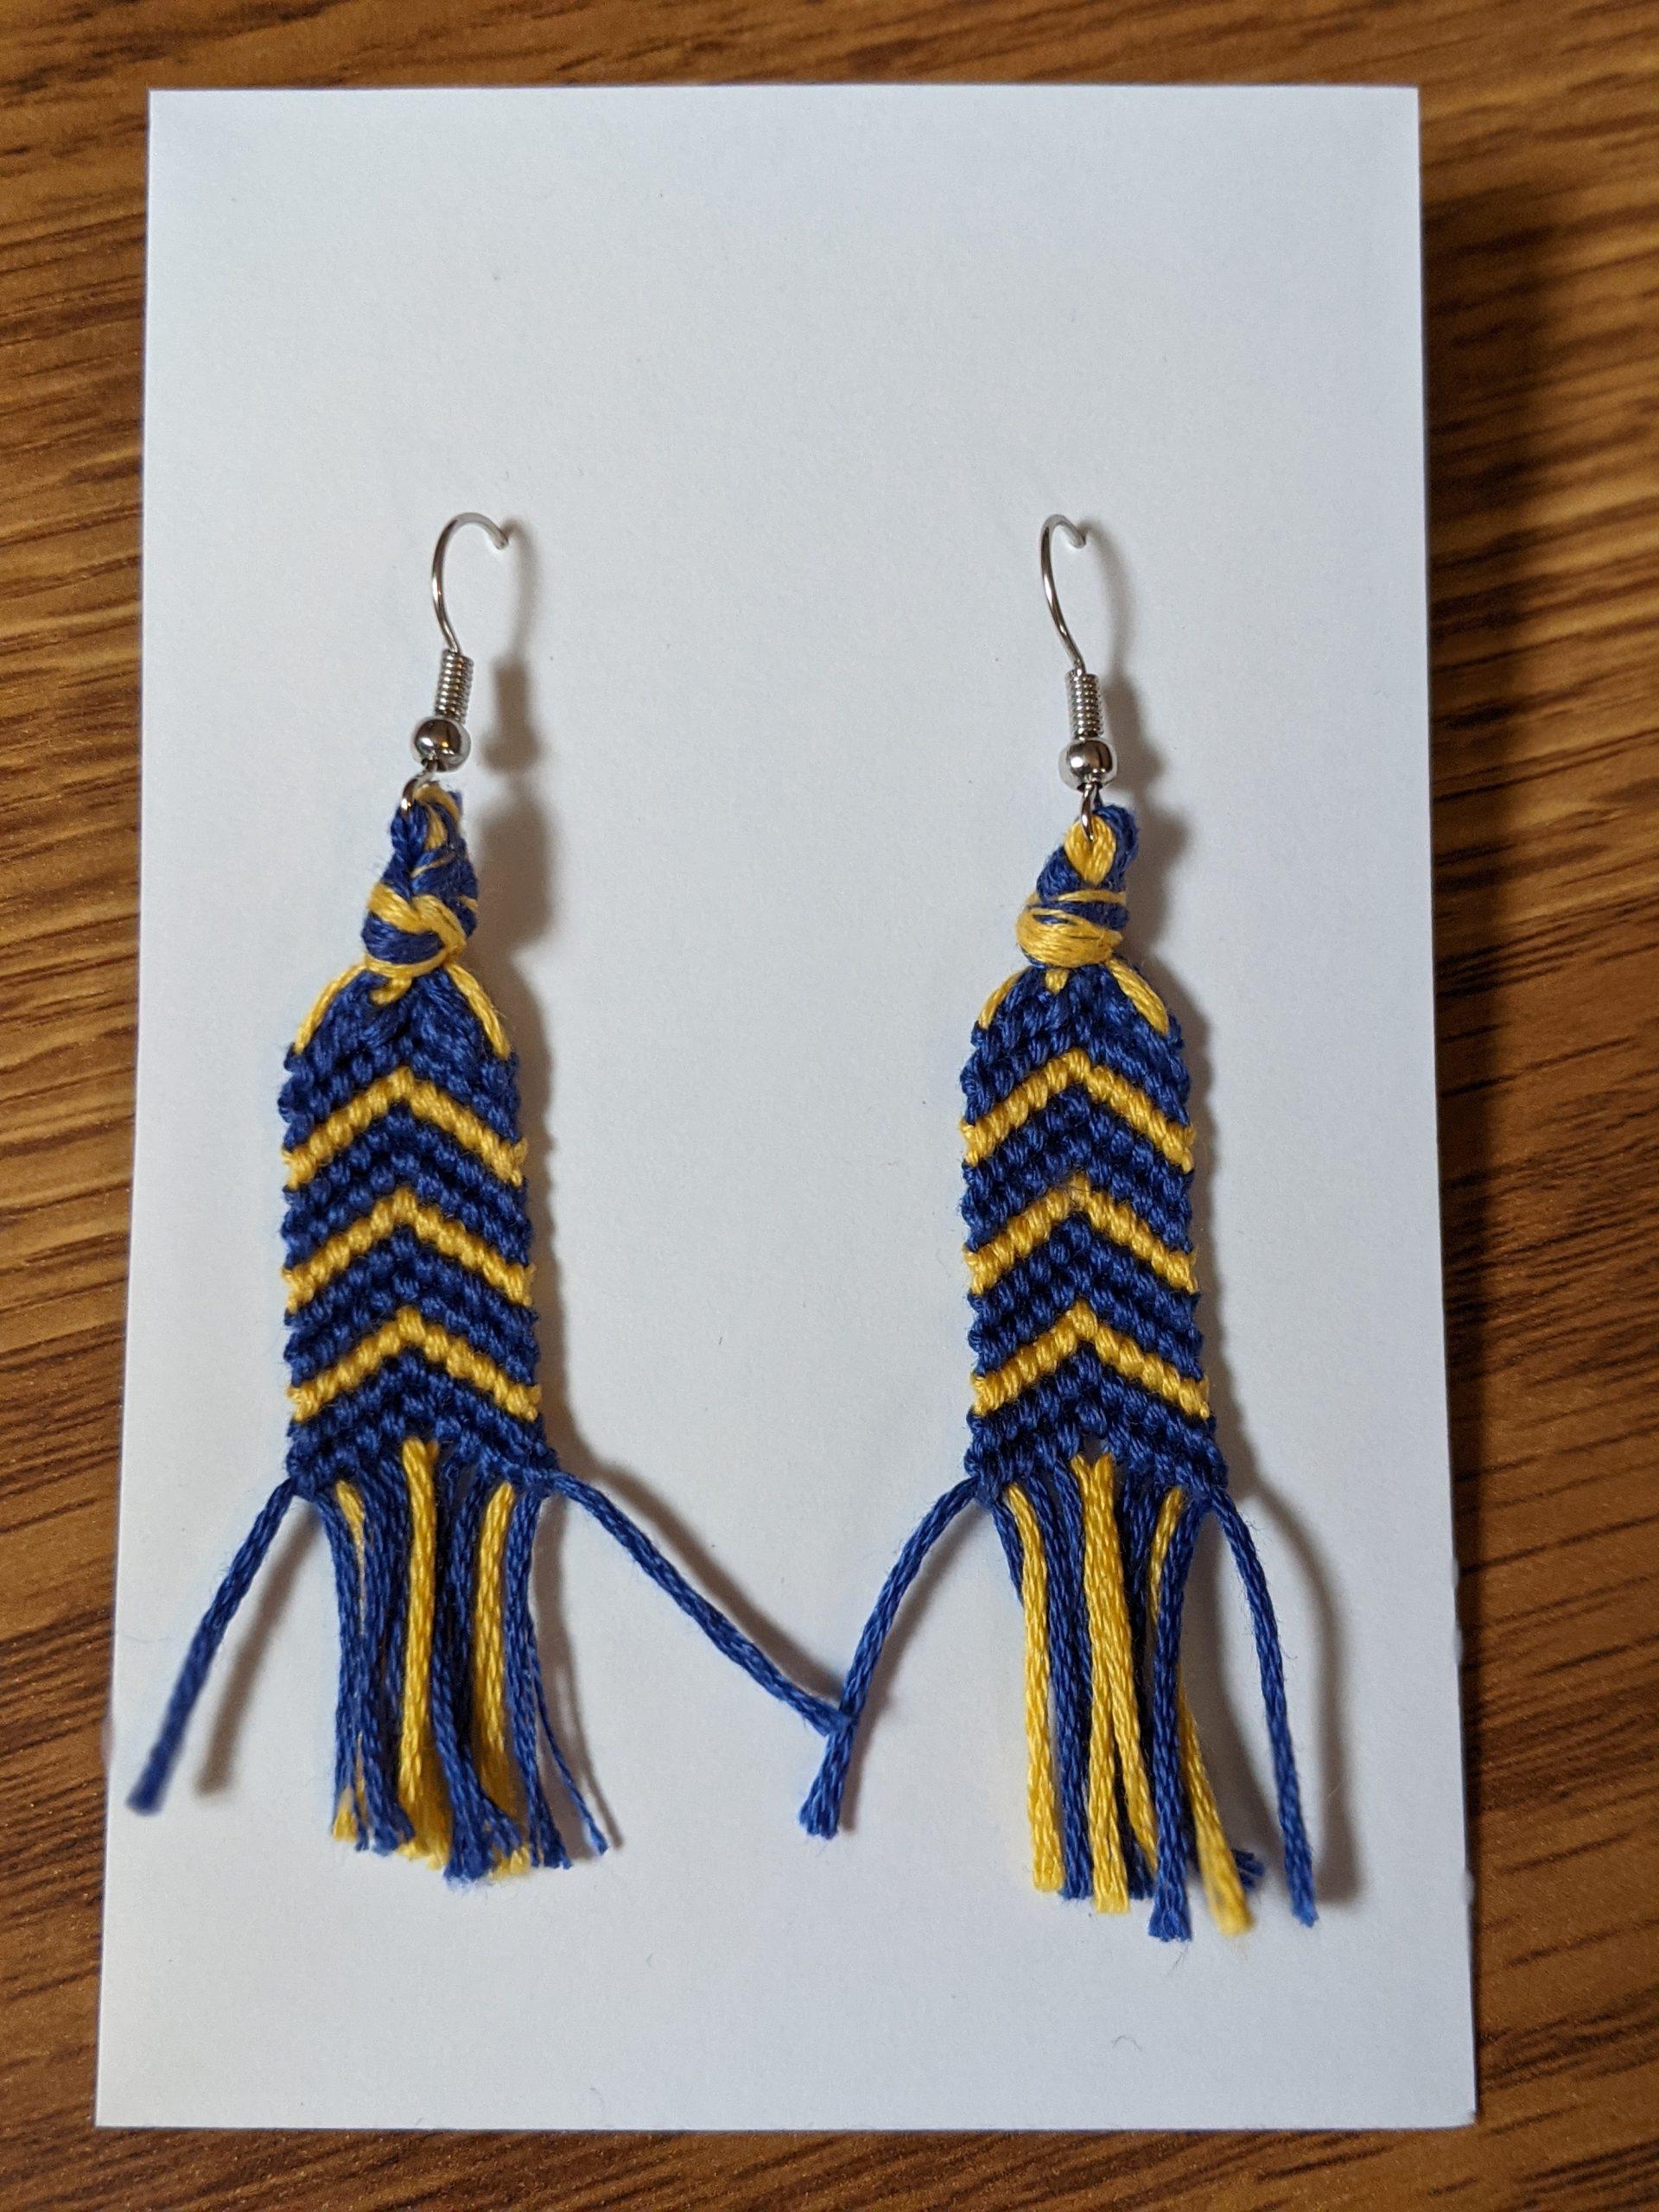 The Lucky Few hanging earrings